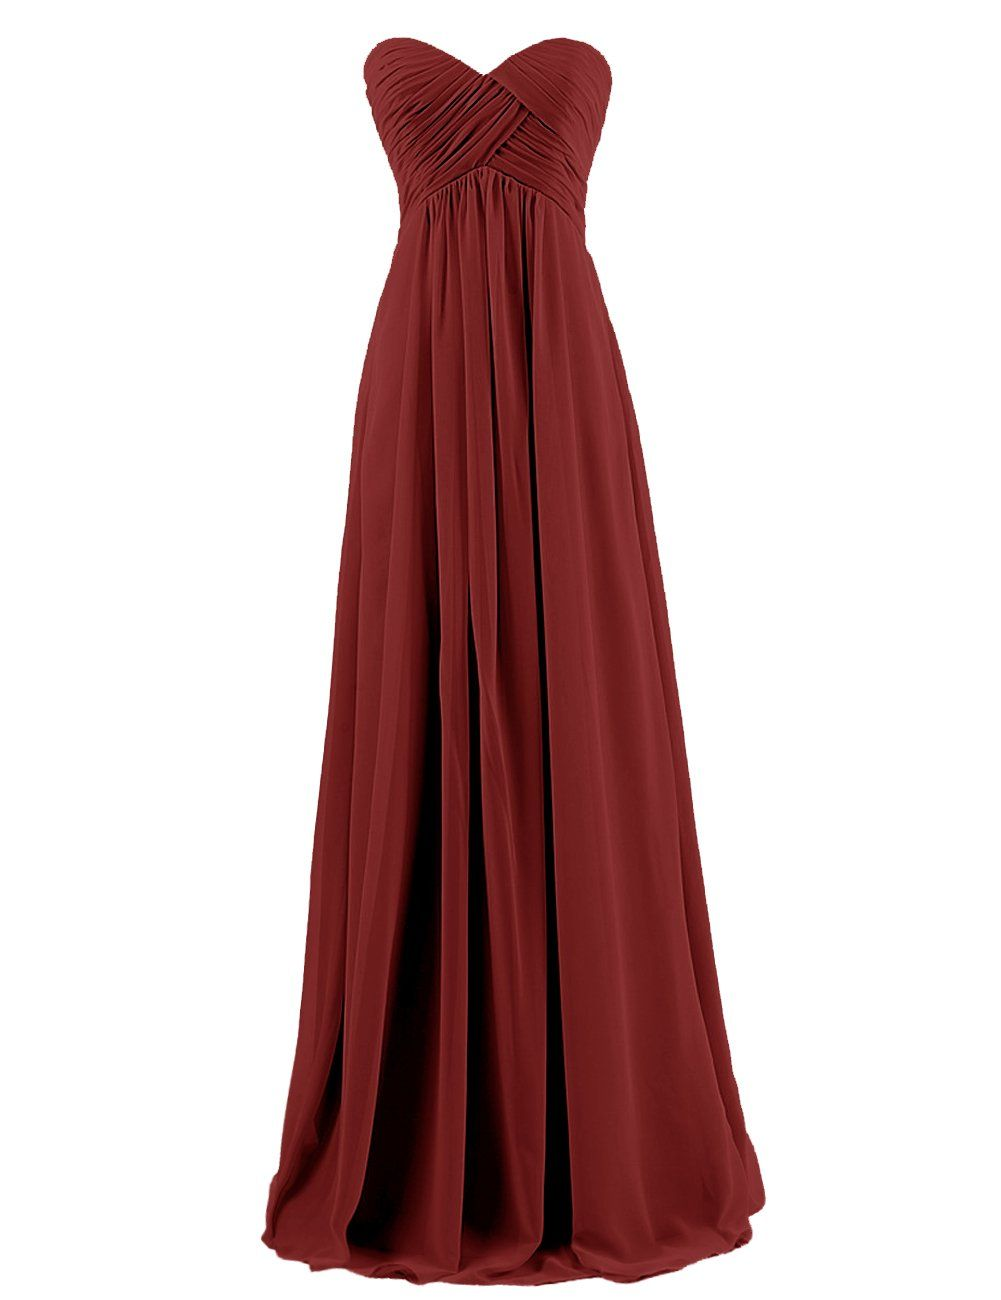 Dresstells sweetheart bridesmaid chiffon prom dresses long evening